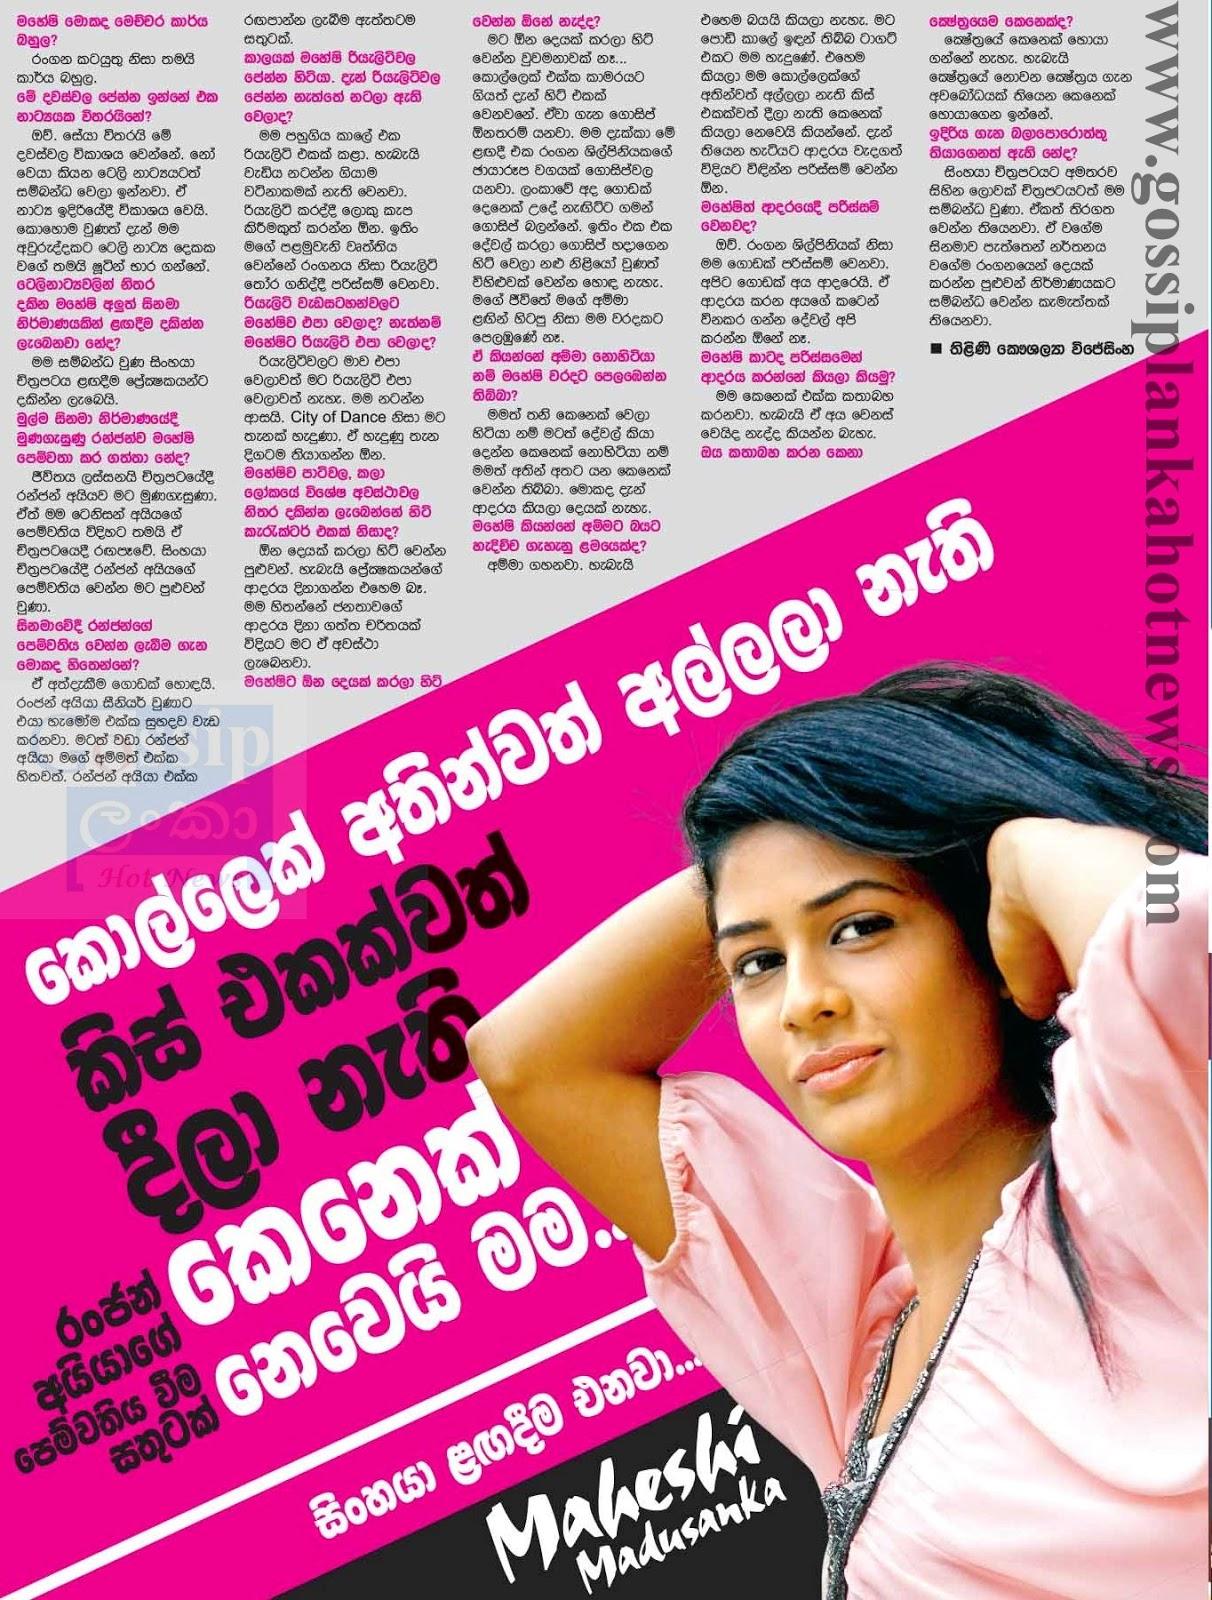 Sri Lankan Models and Actress: Maheshi Madushanka